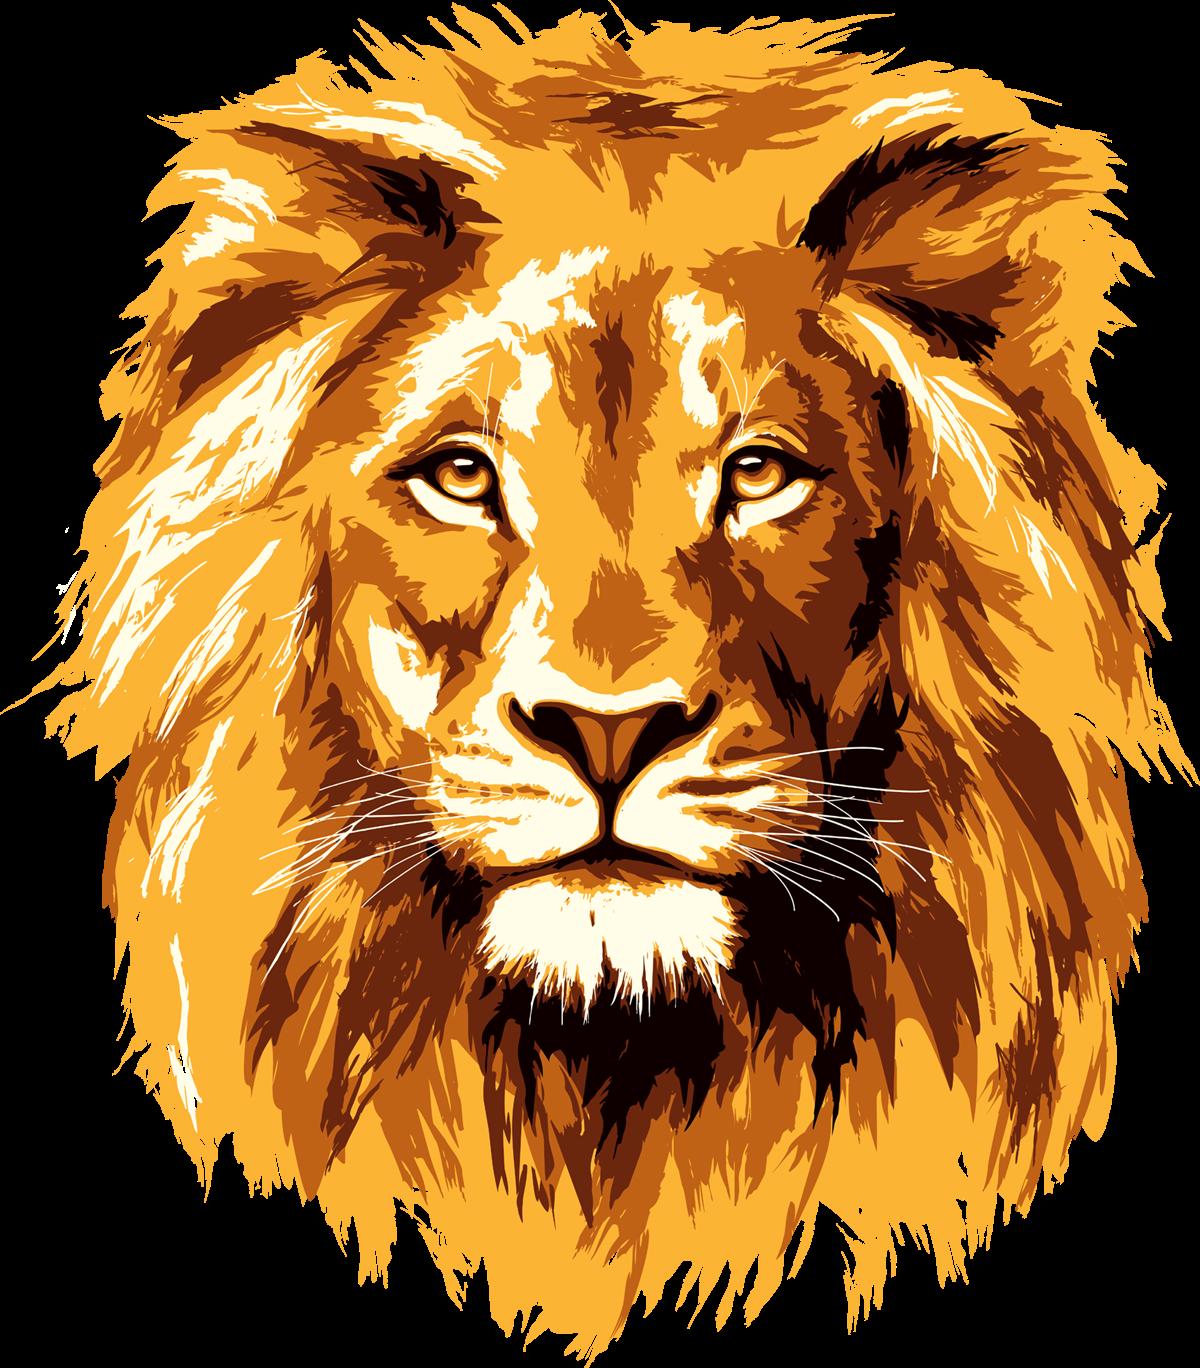 Free Lions Head Png, Download Free Clip Art, Free Clip Art.